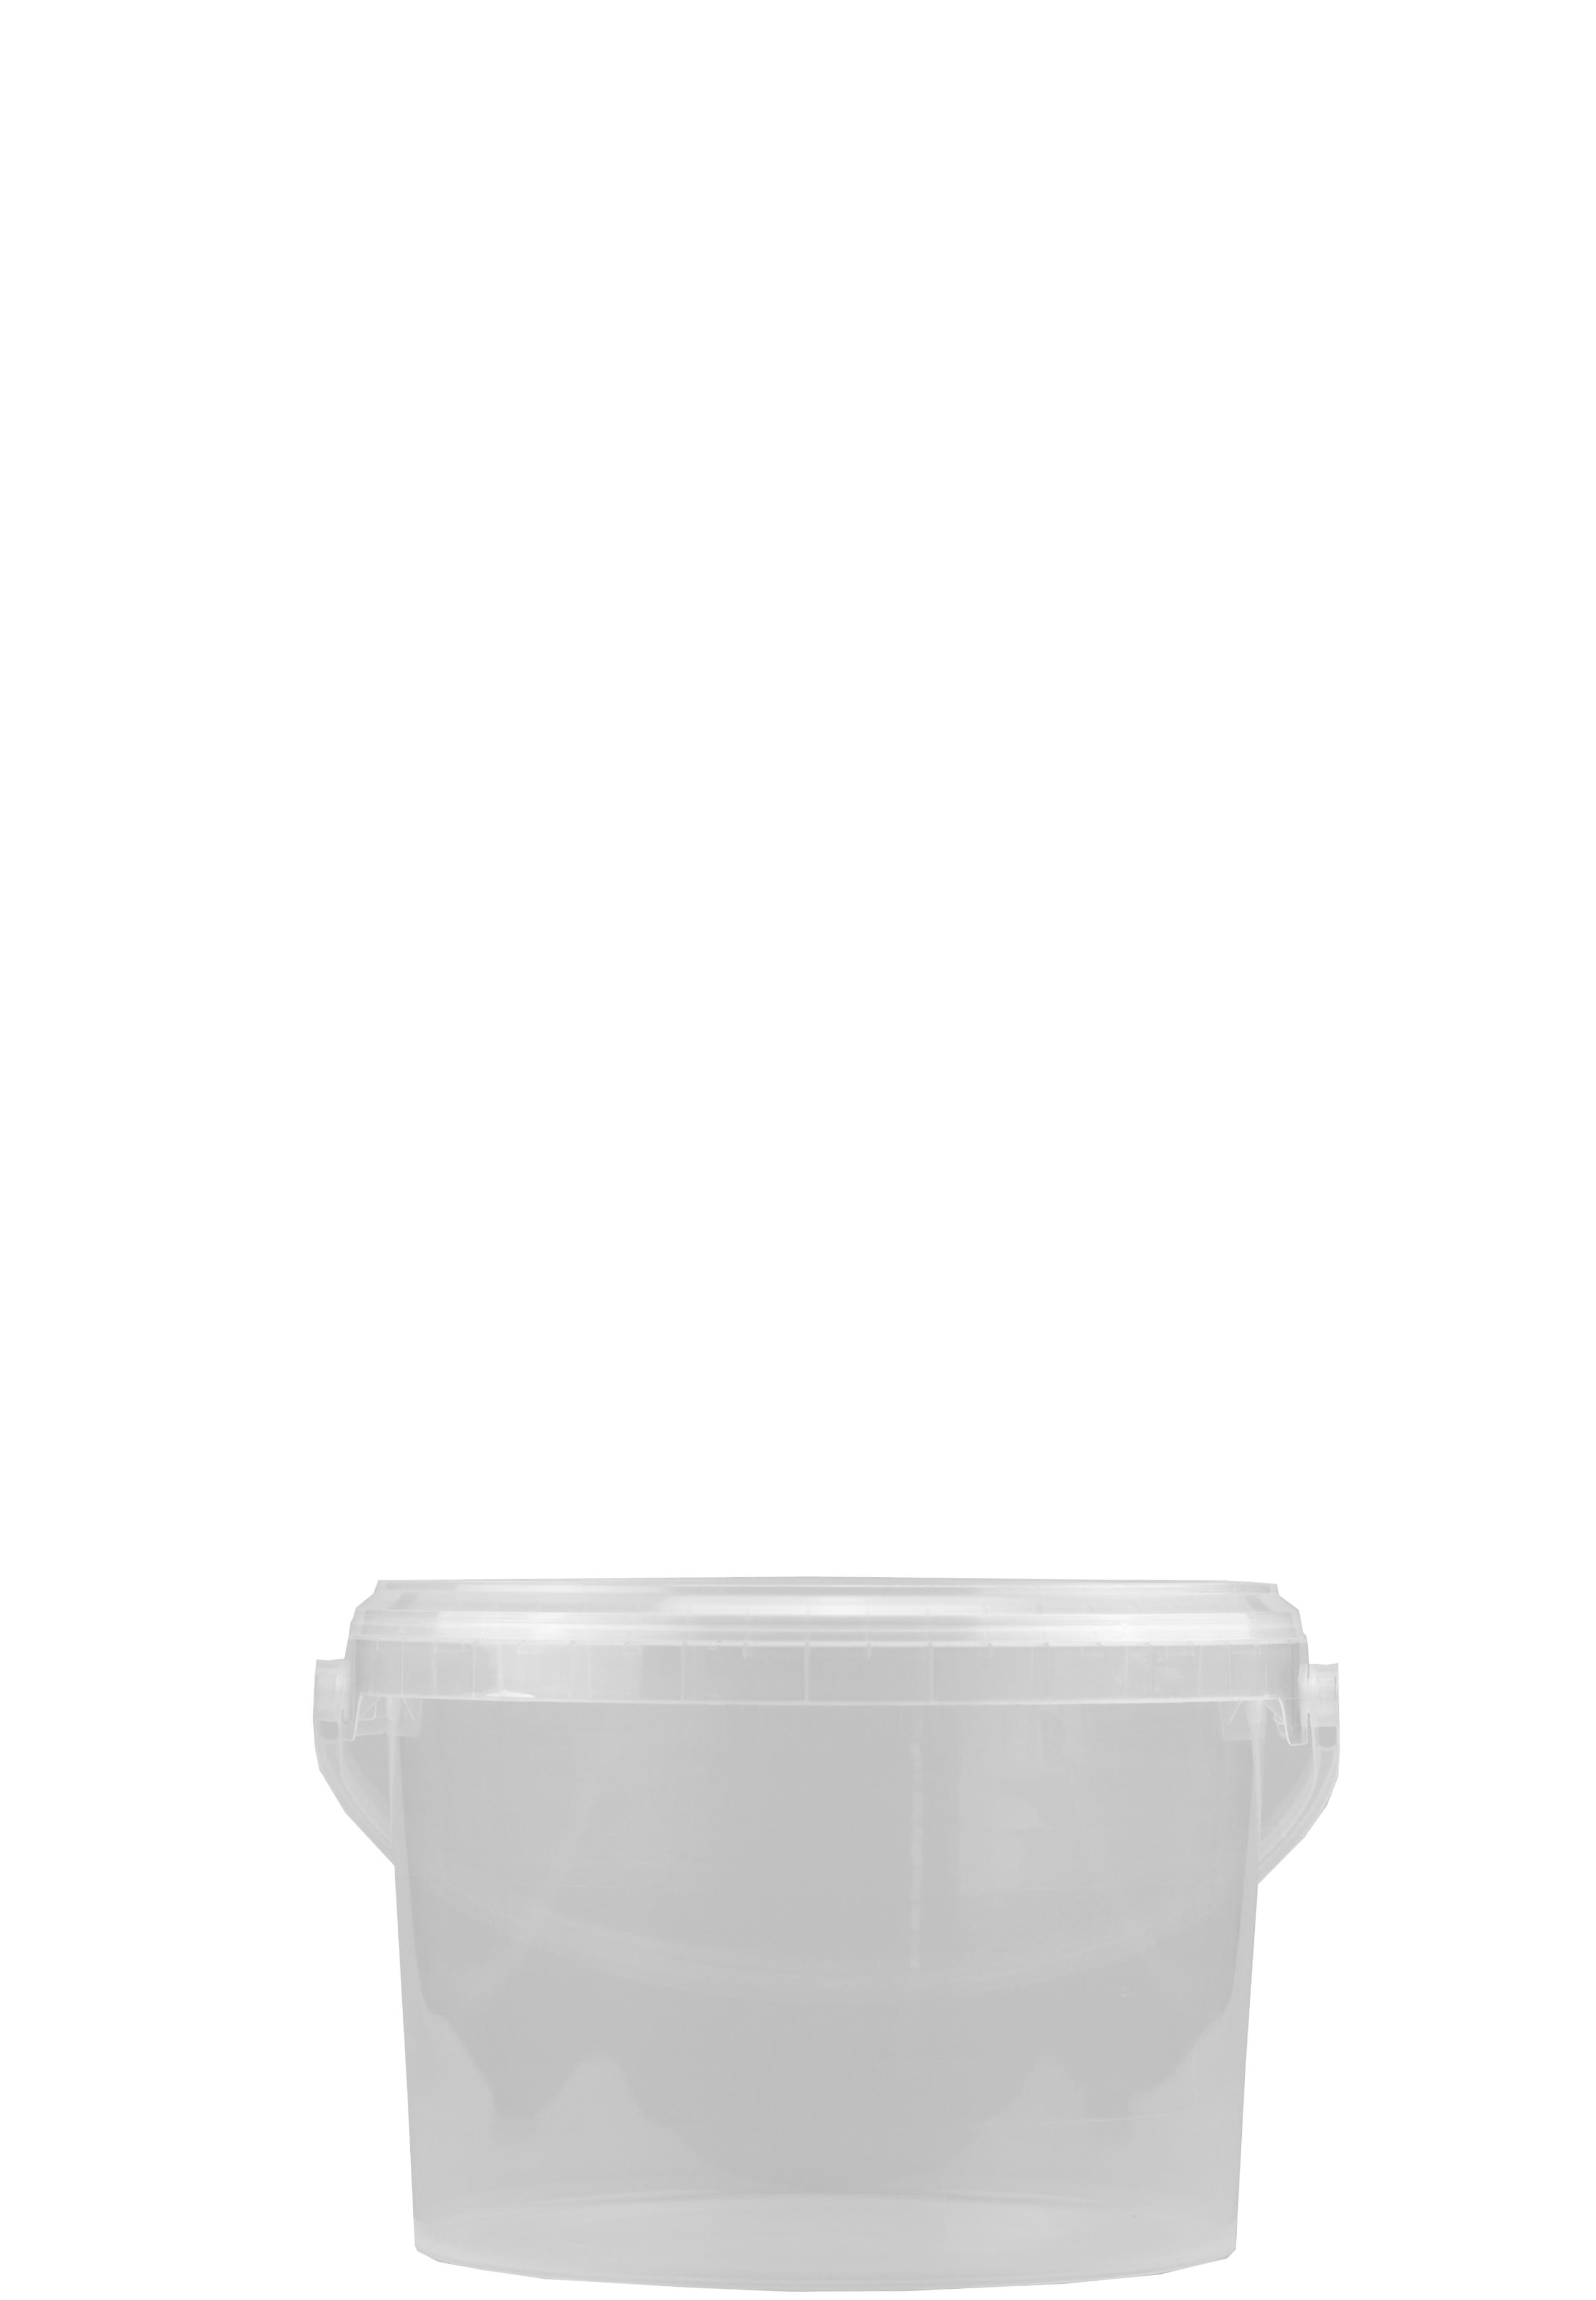 3 liter bucket